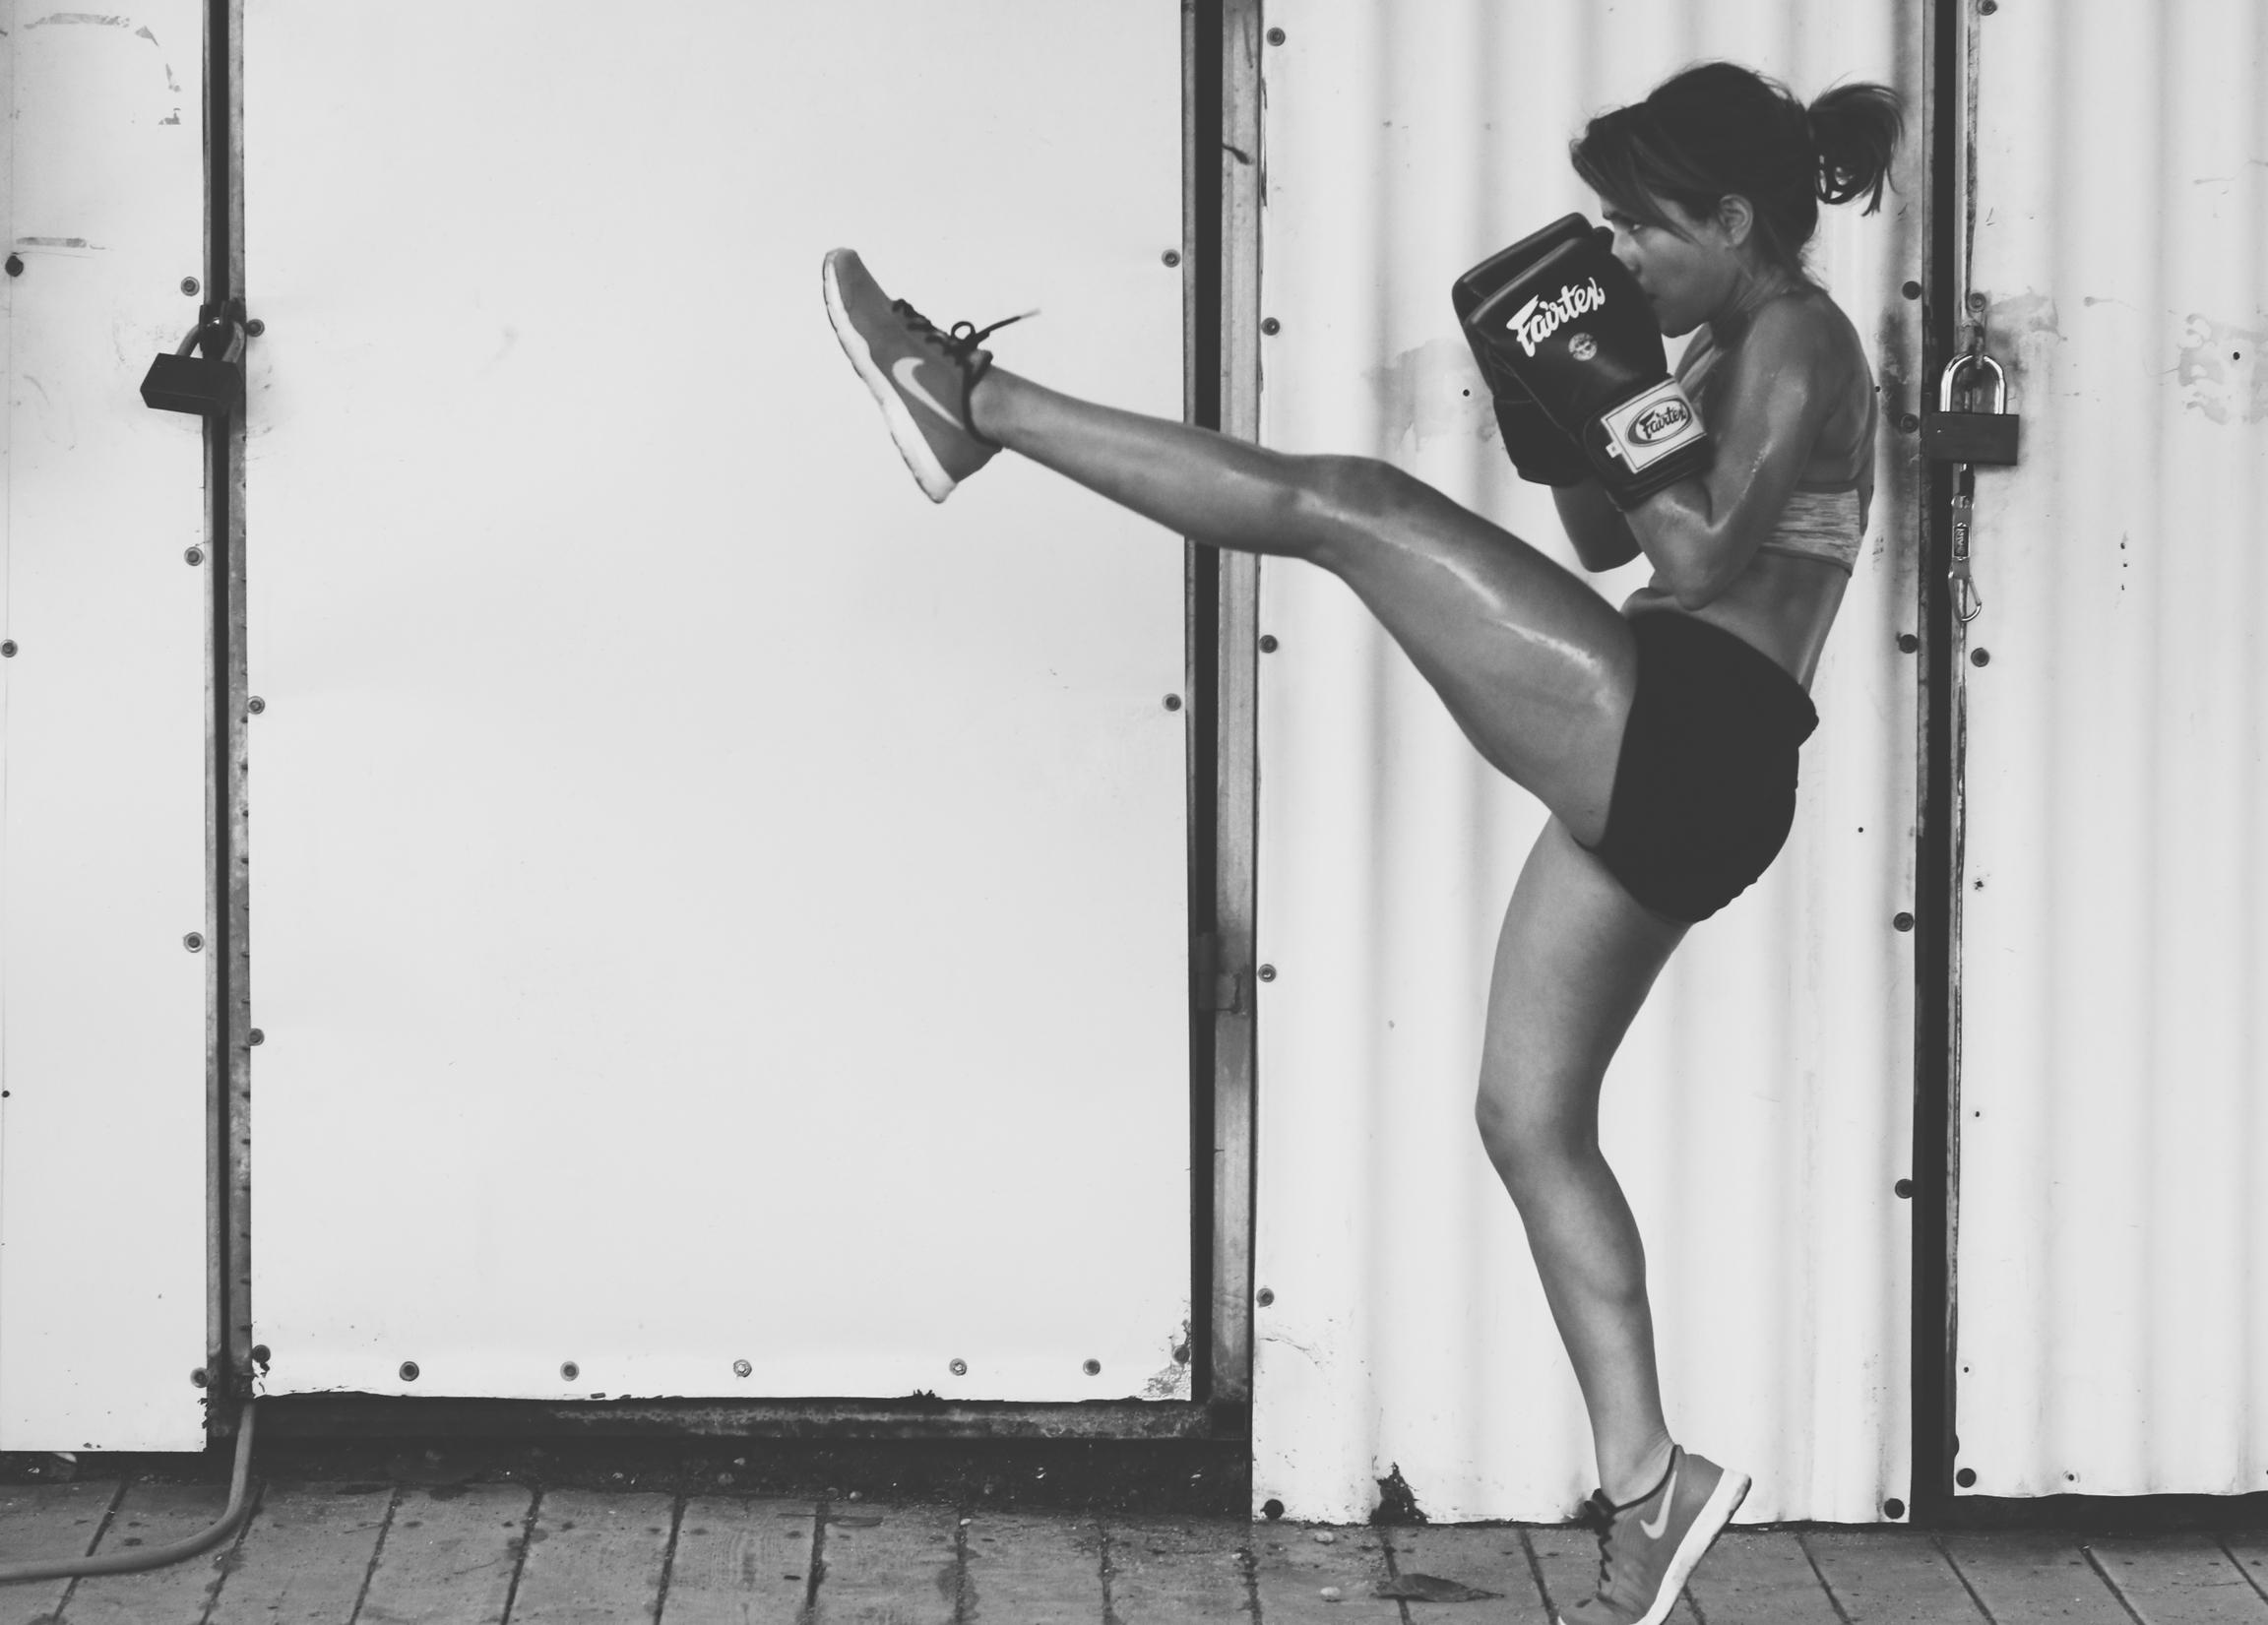 michelle cohen kickboxing